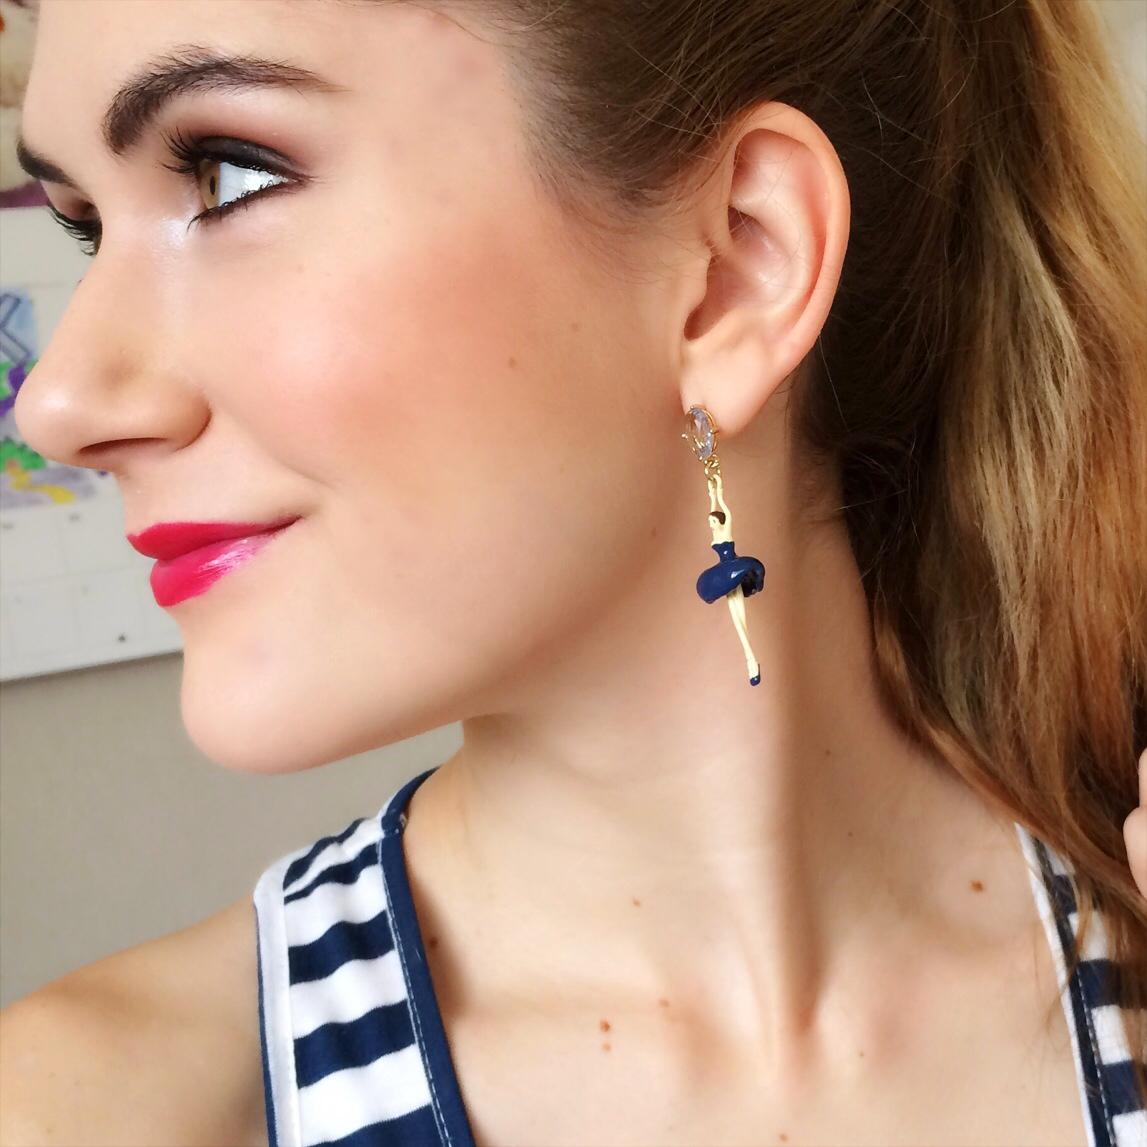 Ballerina Earrings, Cute Fashion Blog